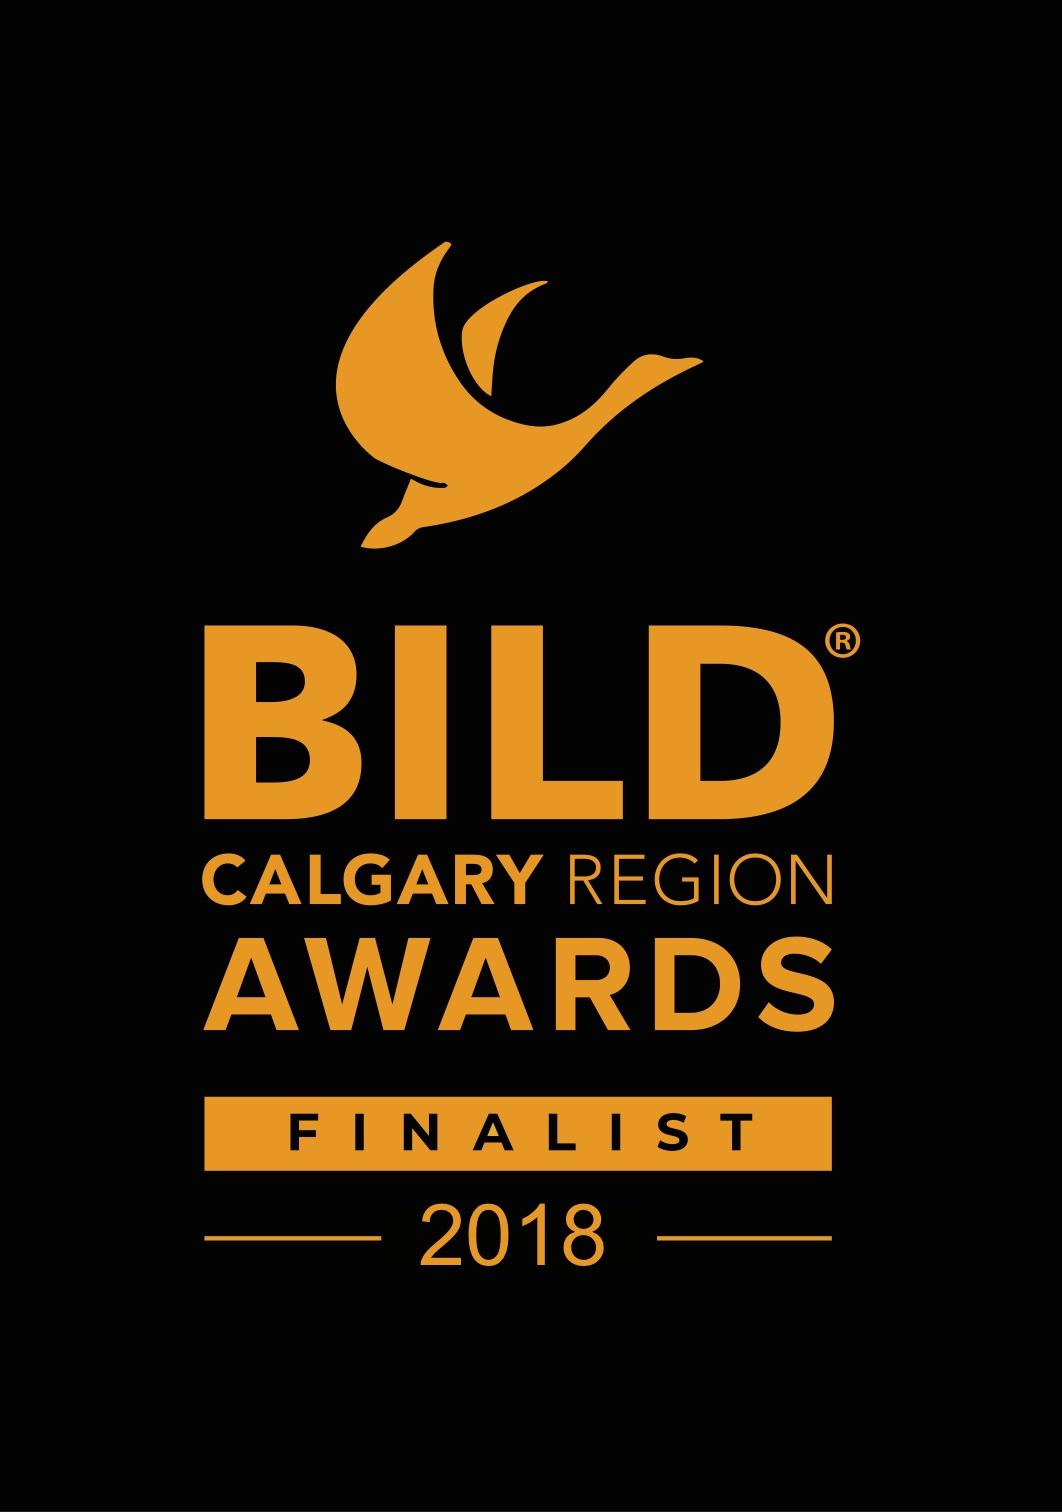 BILD_awards_logooptions.jpg